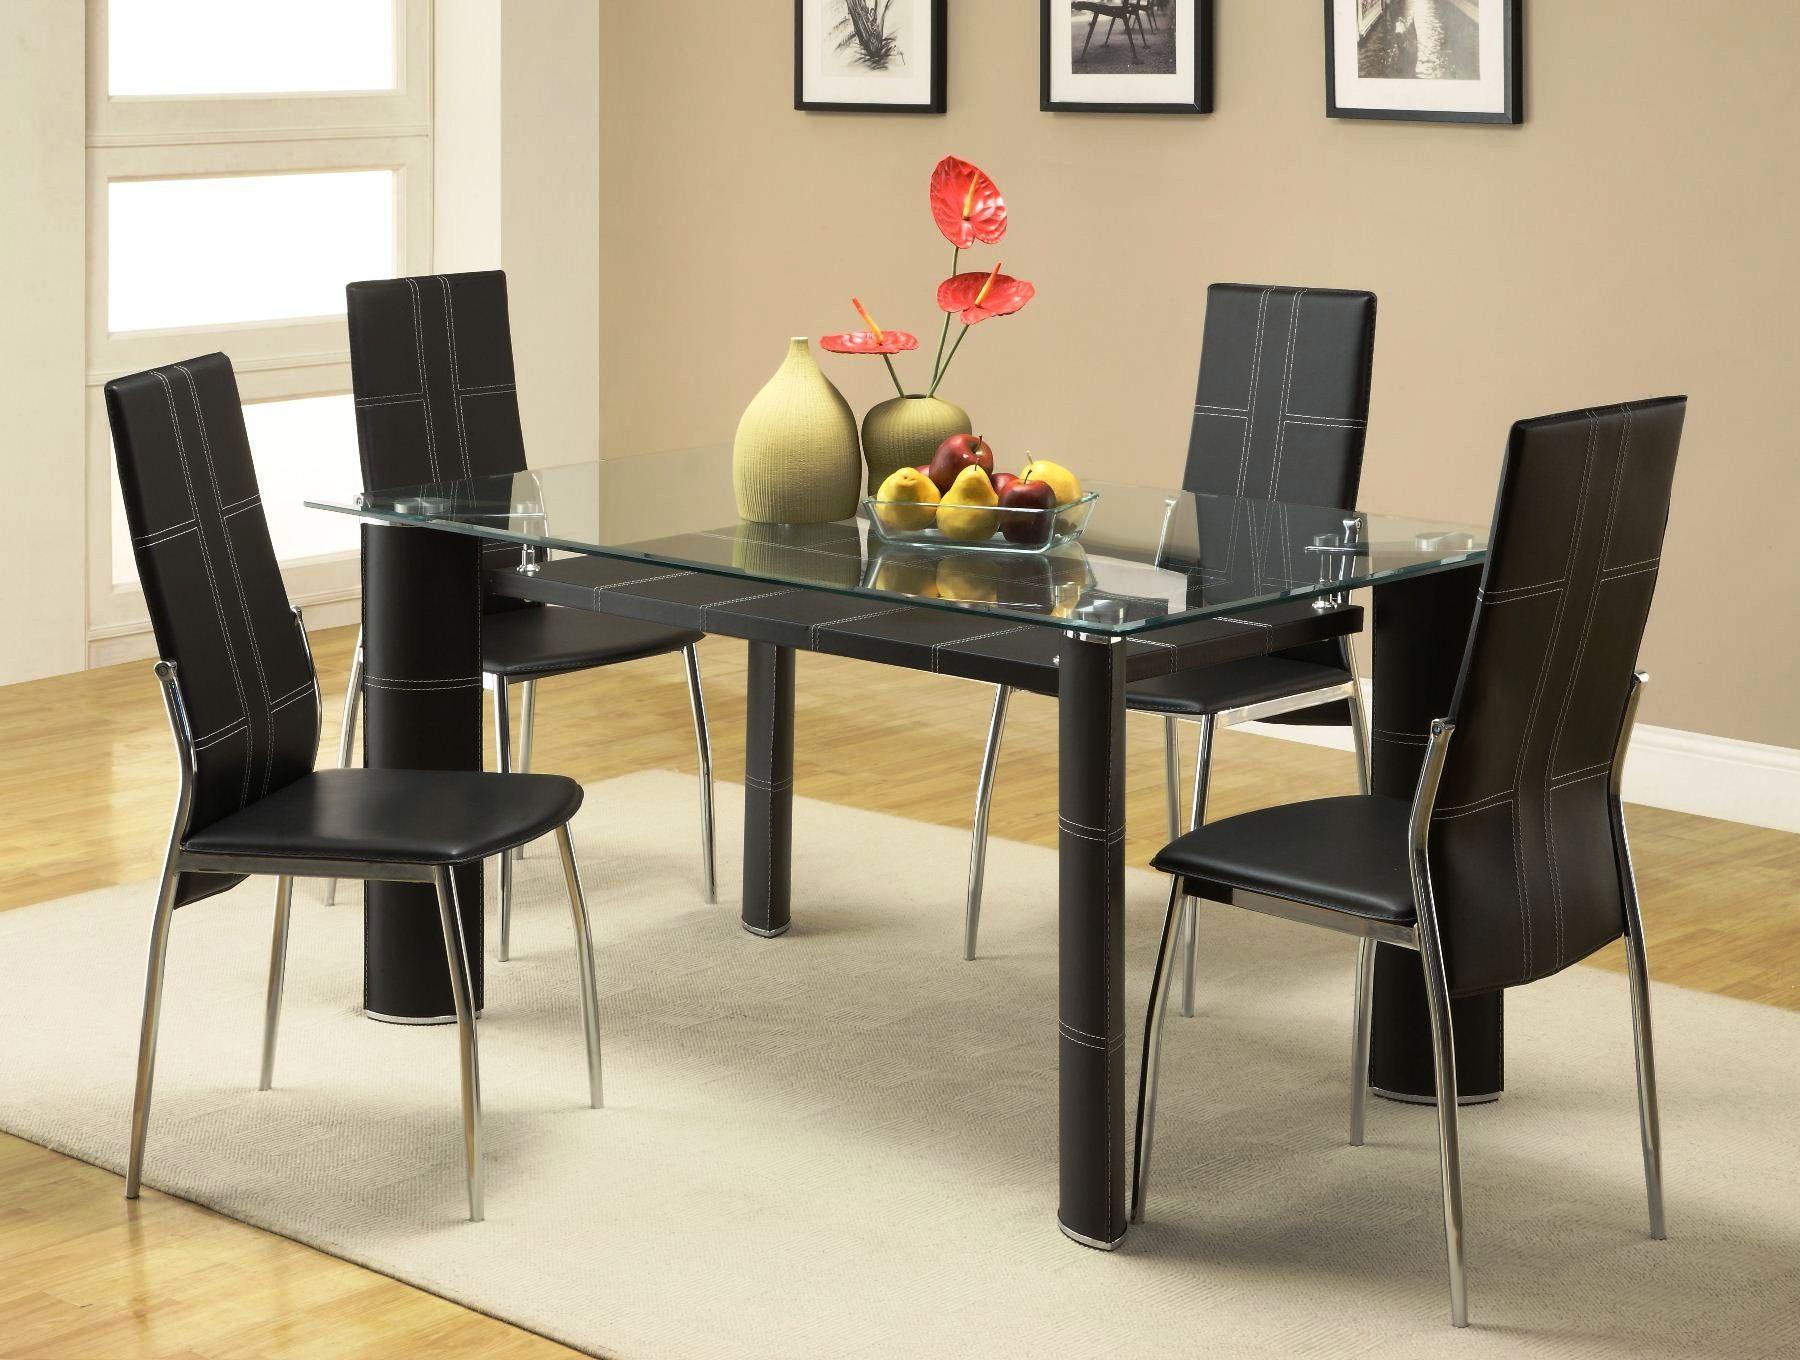 Wilner Rectangular Glass Top Dining Table From Homelegance